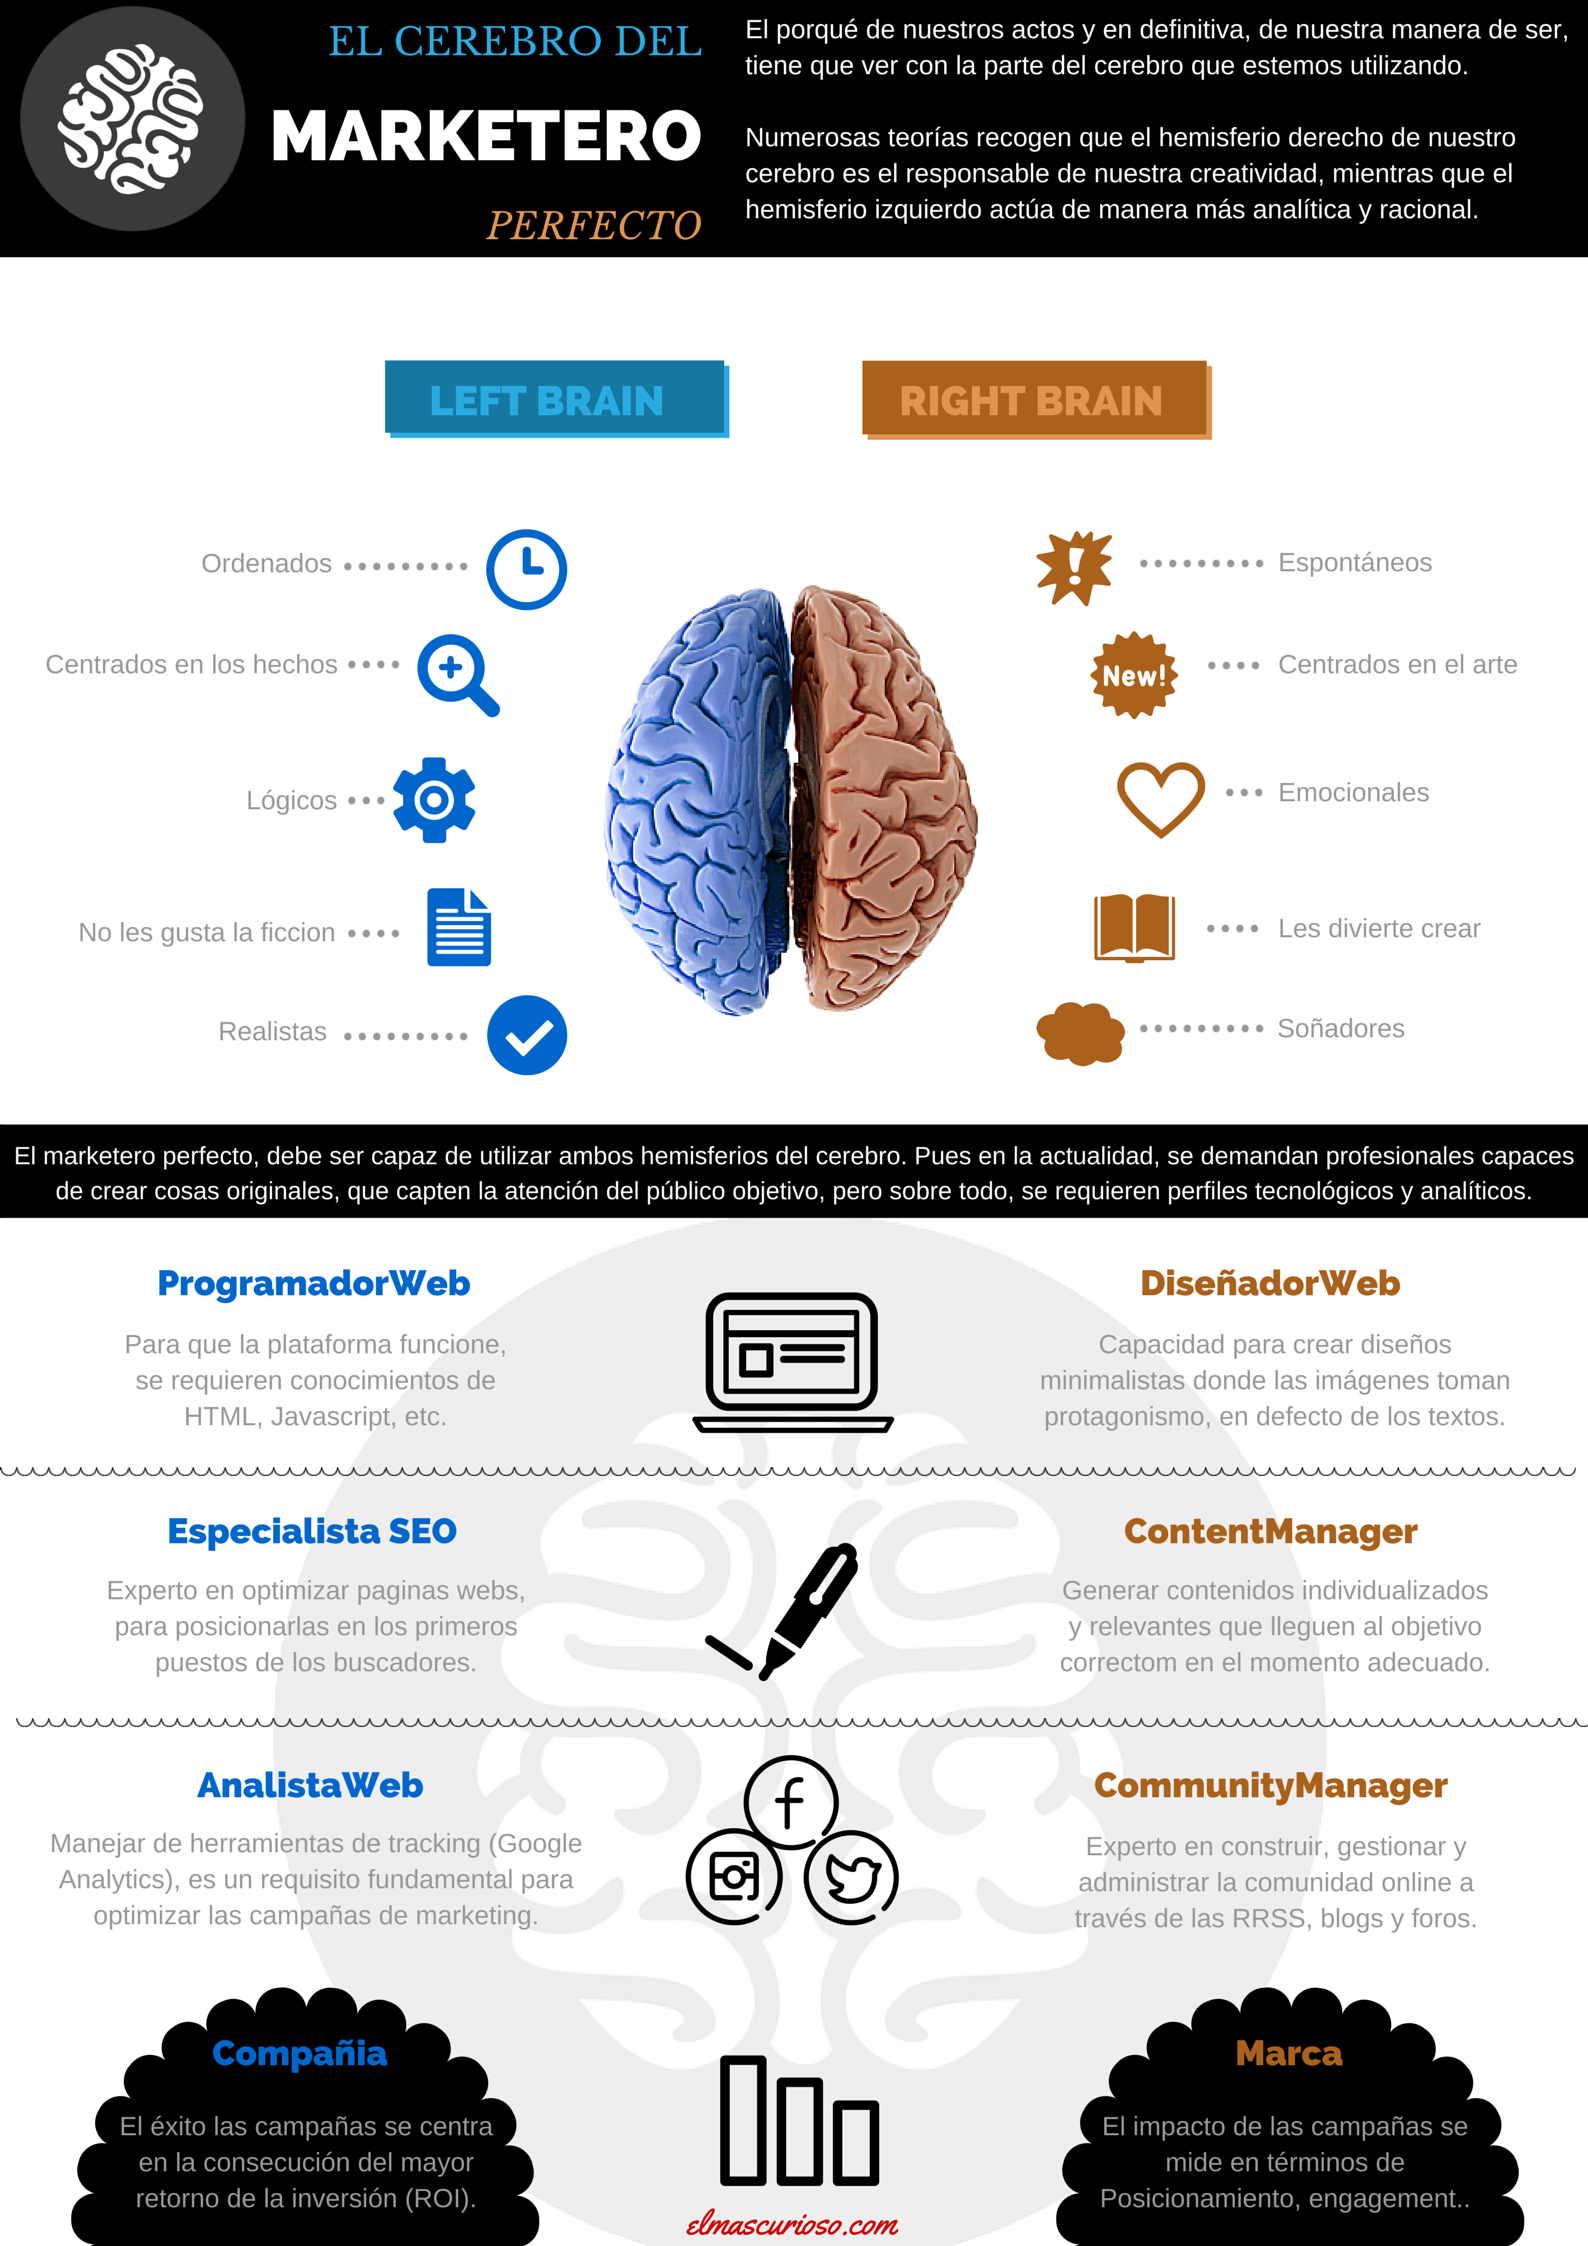 Mercadólogos de hemisferio derecho e izquierdo